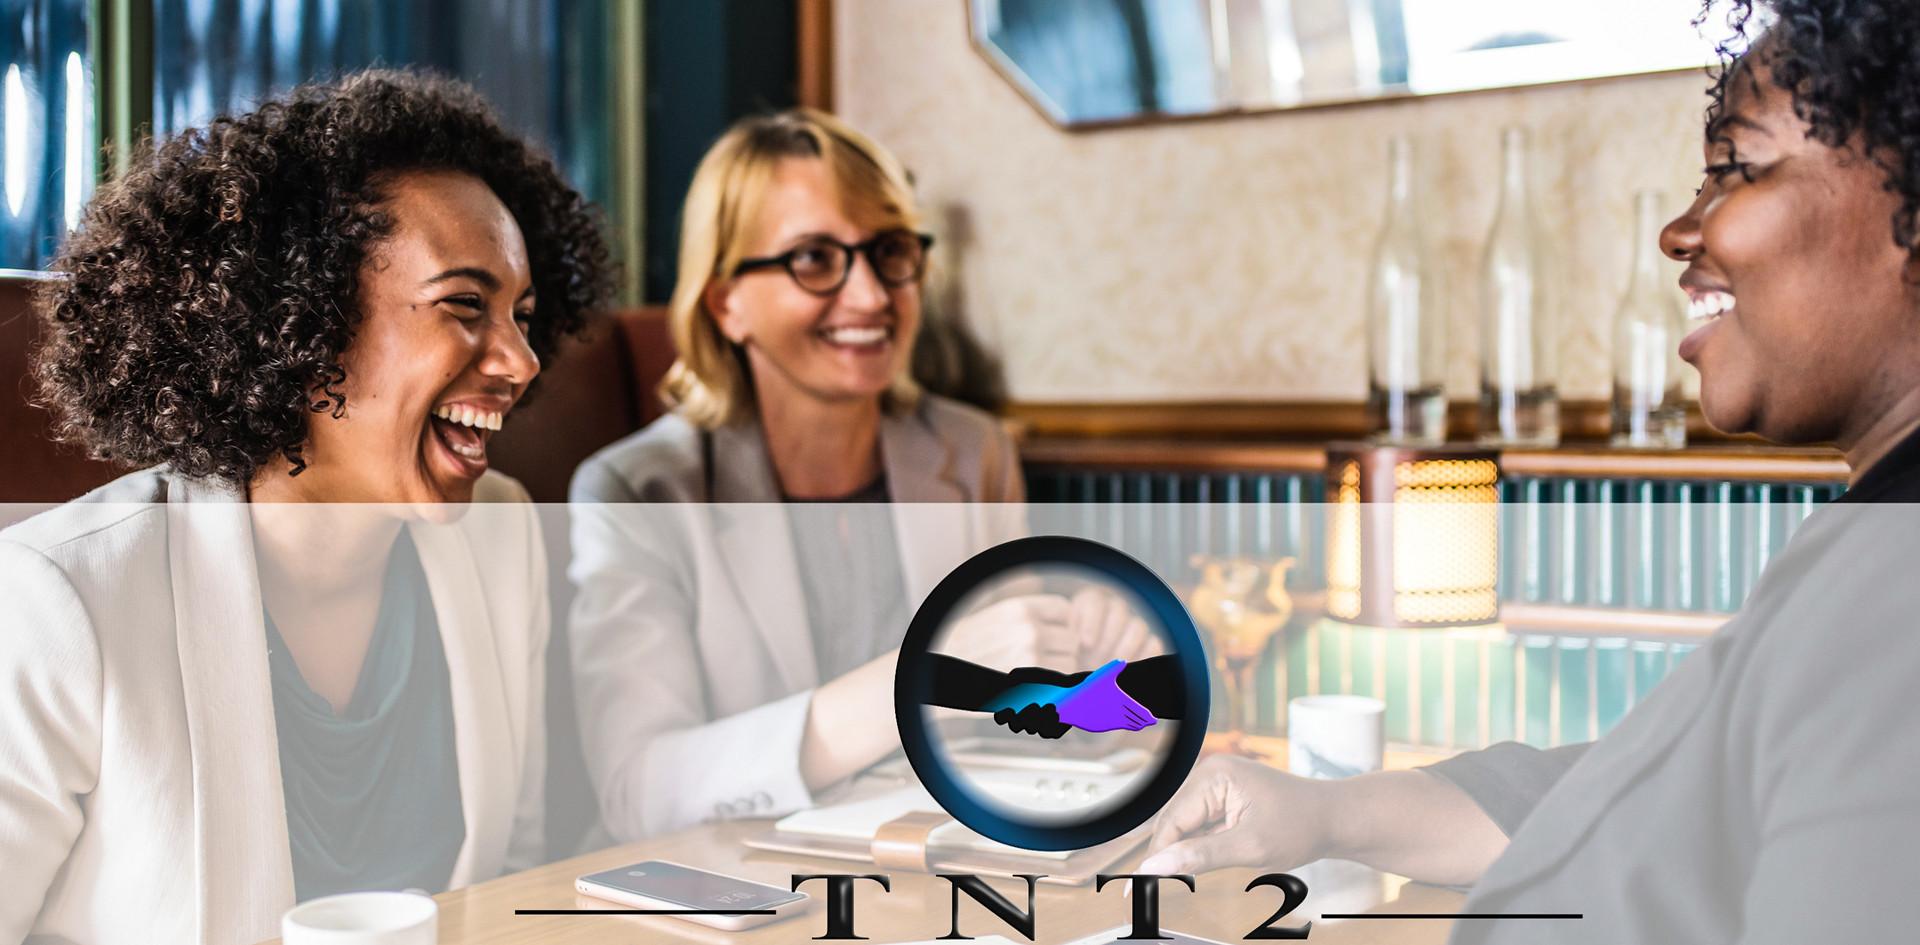 TNT2-1059112.jpg